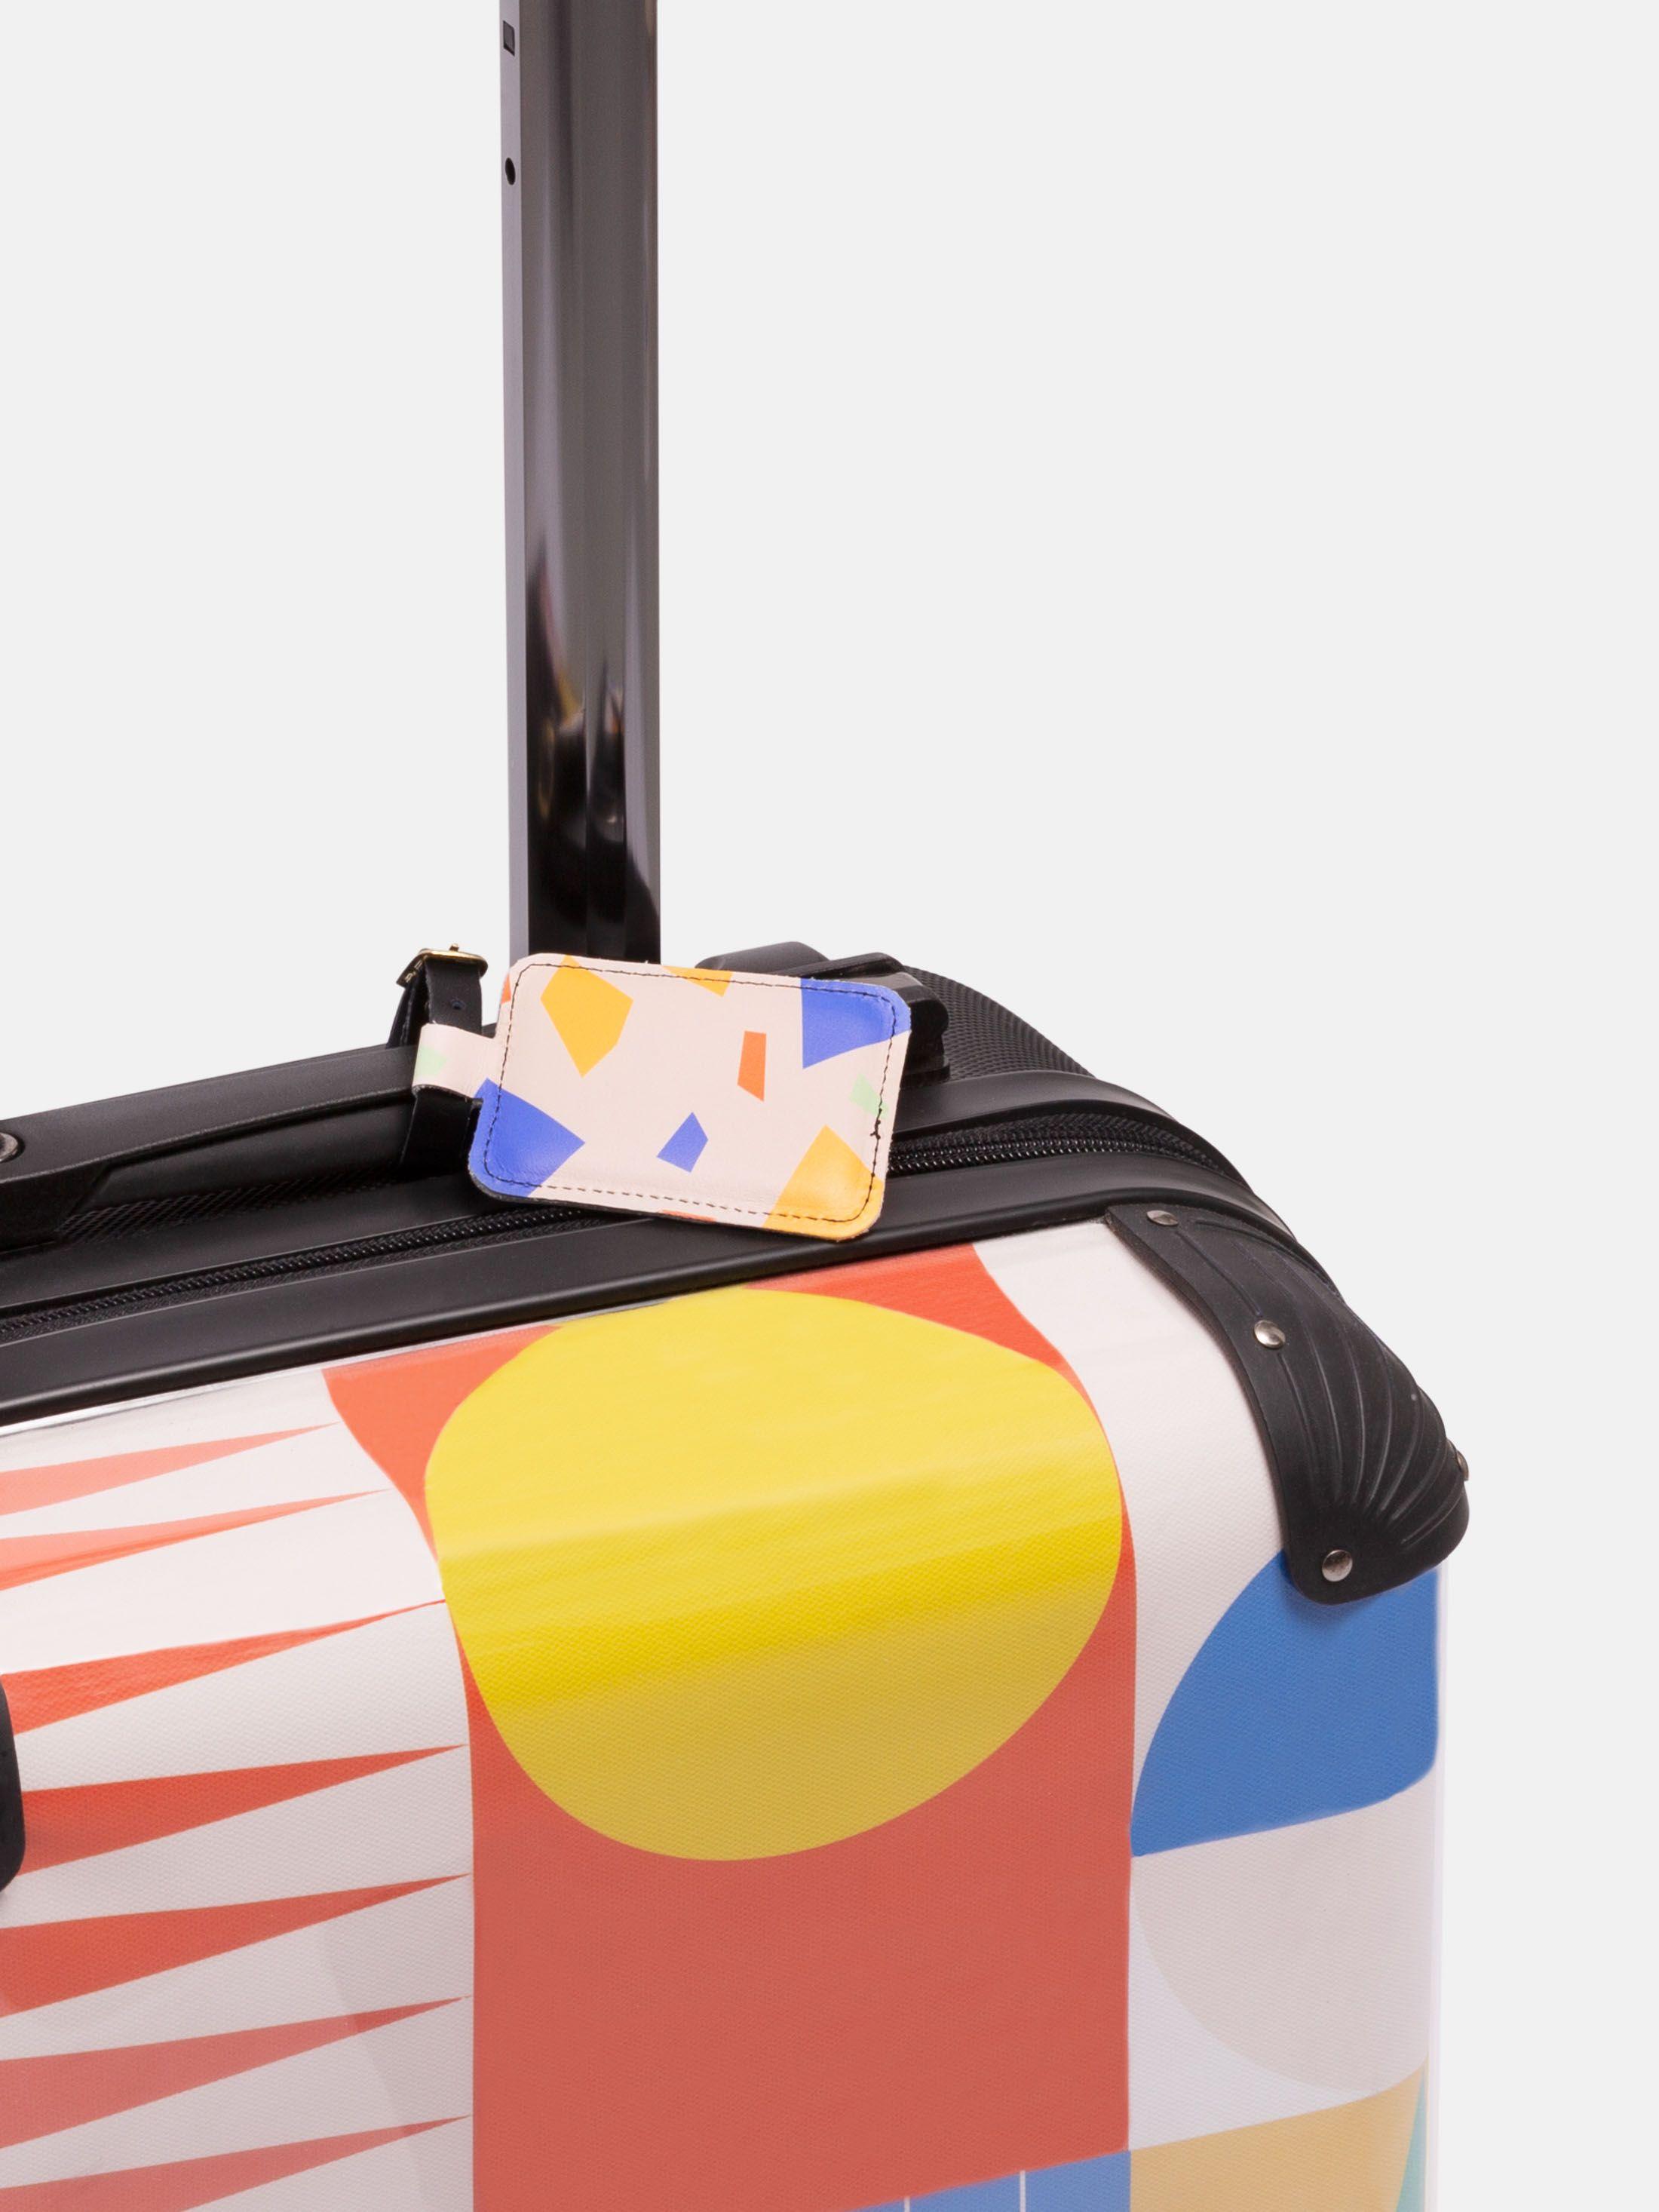 custom made luggage tags